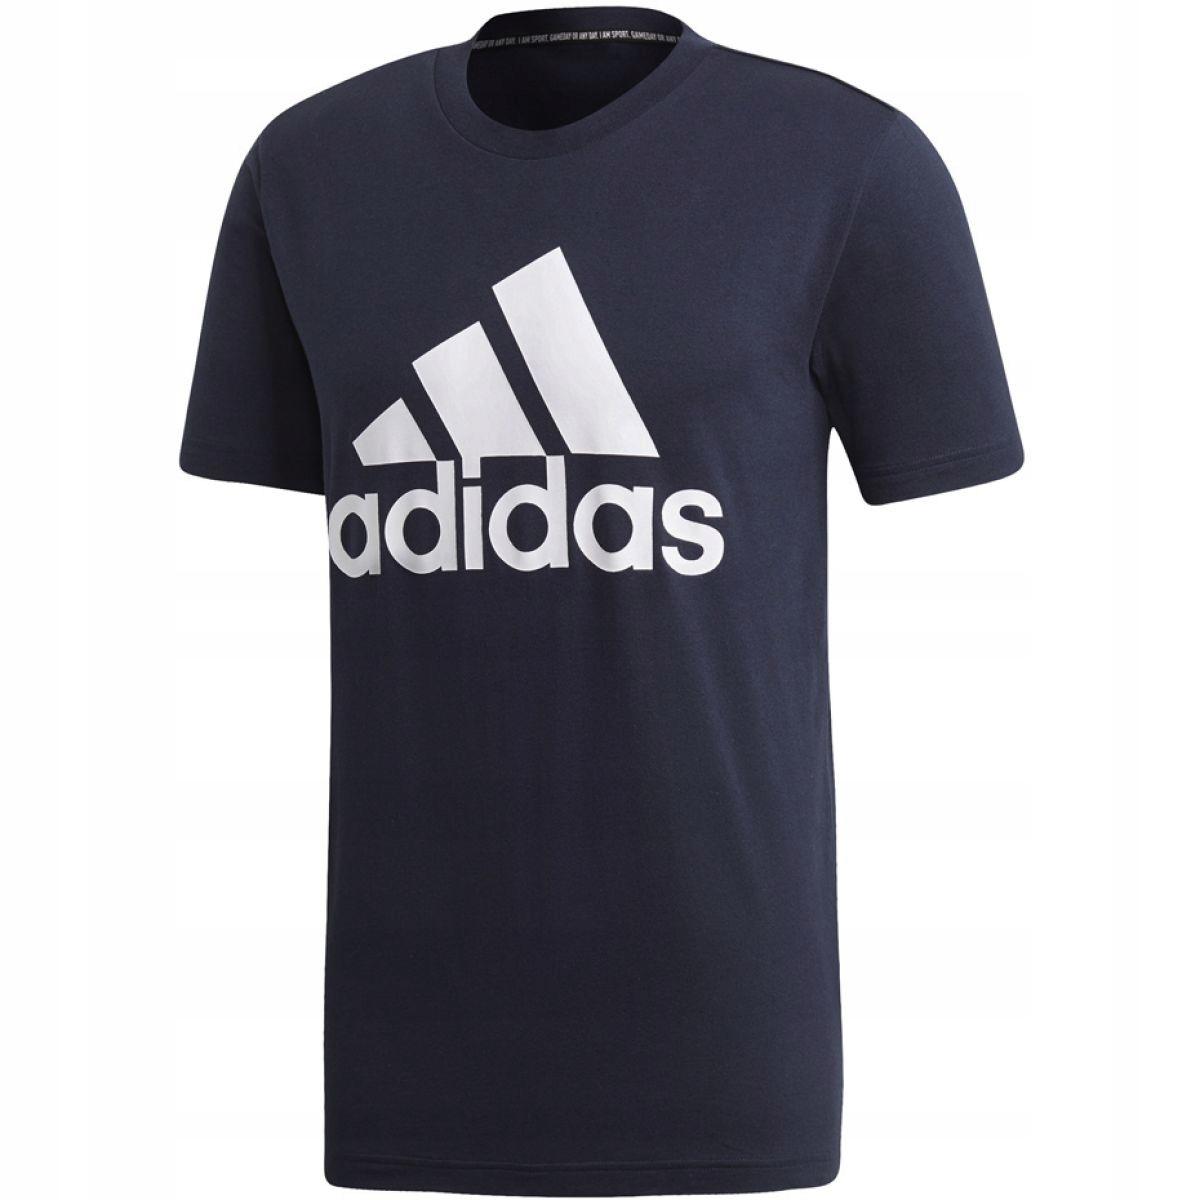 3ef6de39db3df2 Koszulka adidas MH BOS Tee M DT9932 L - 7693409474 - oficjalne ...